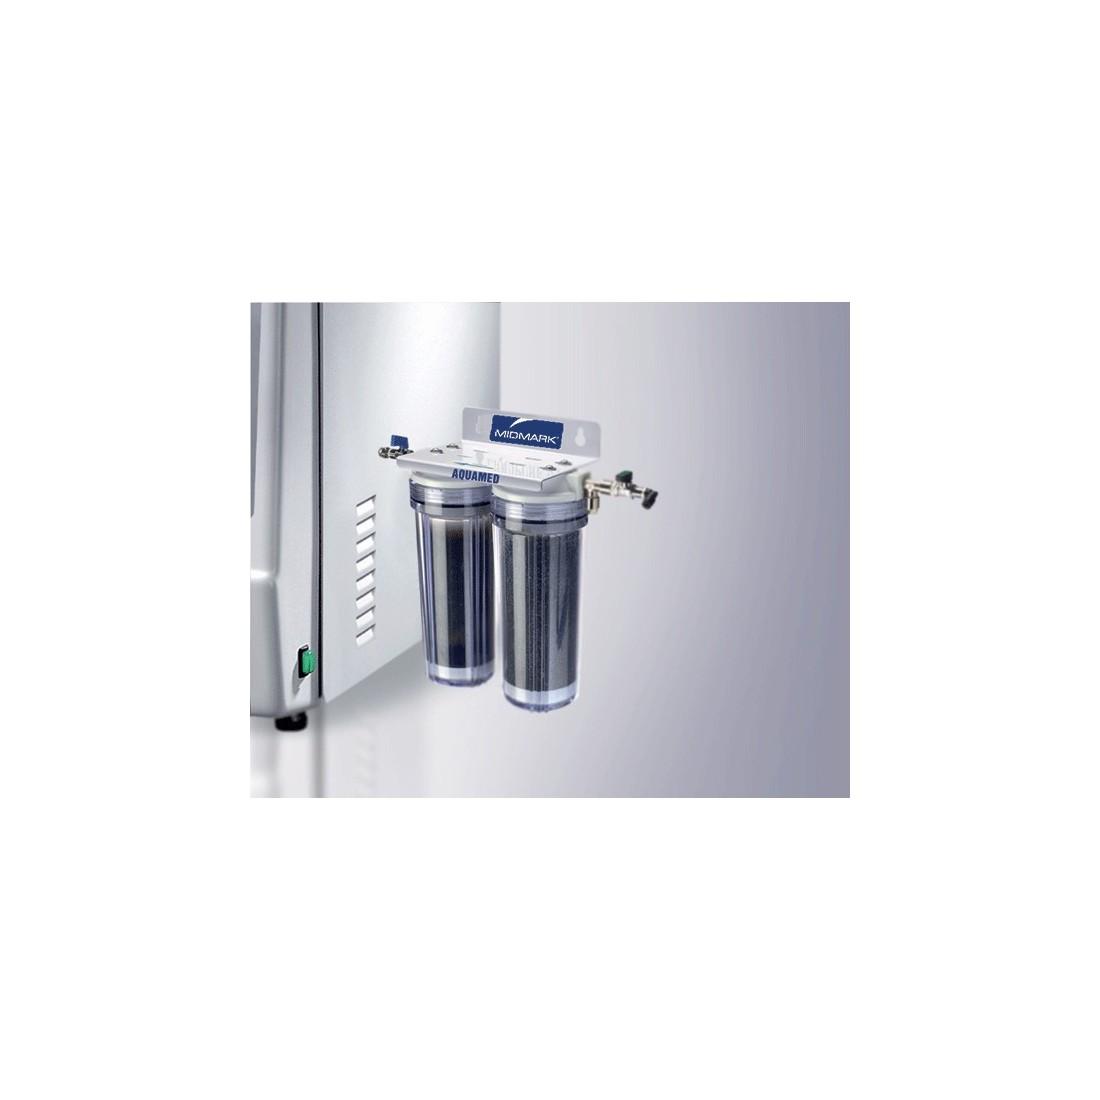 Wasserentsalzer Aquamed